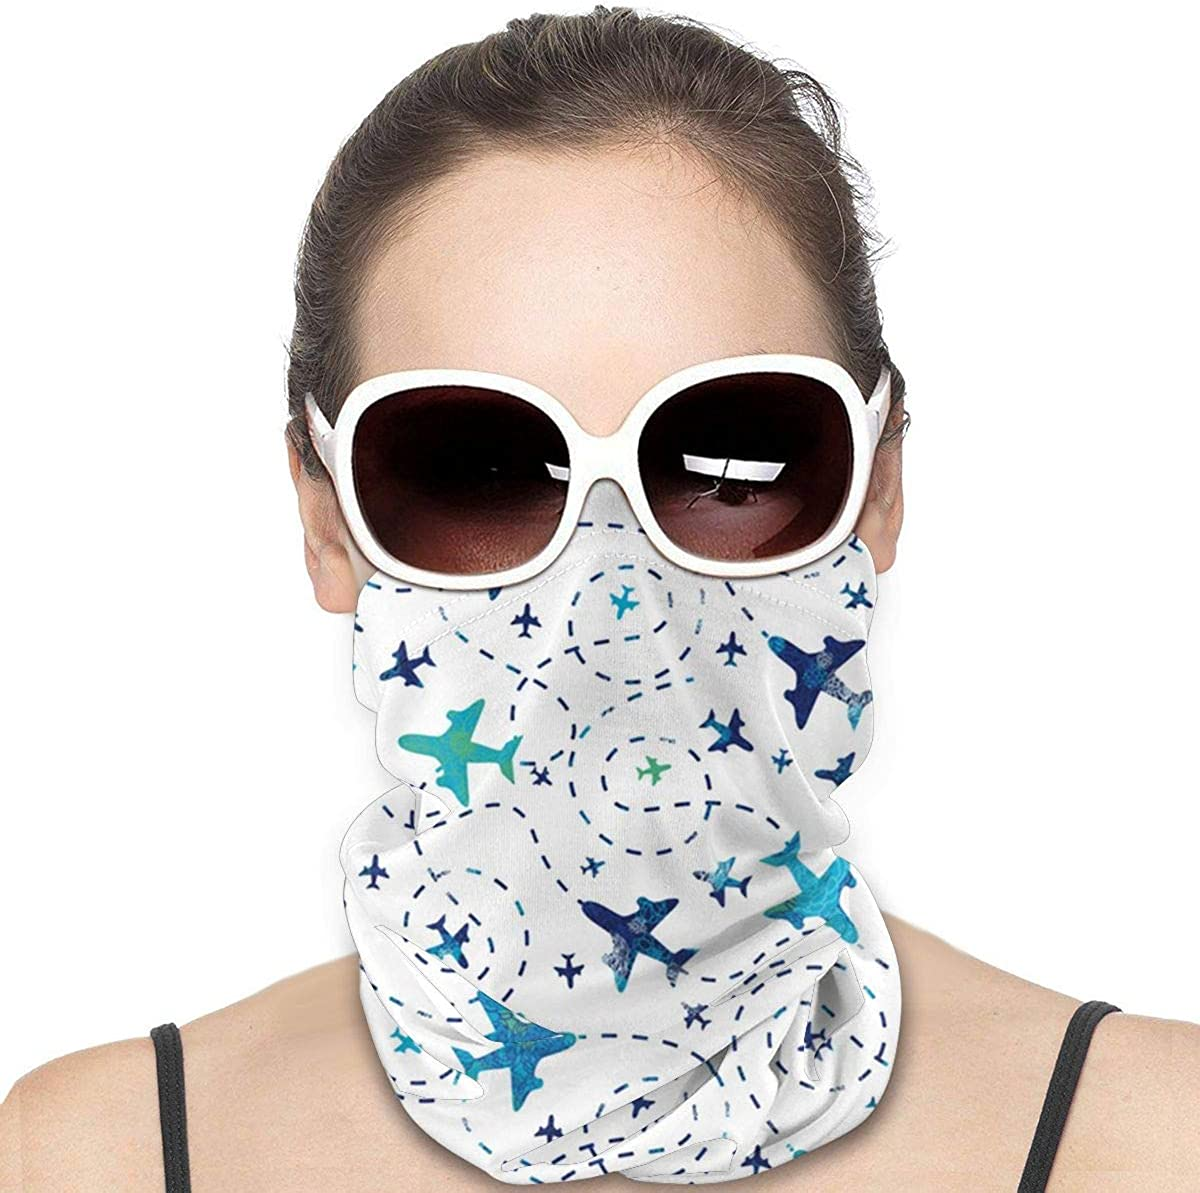 Cherry Blossom Neck Warmer Bandana Balaclava Scarf Mask Beanie Ski Headwear Elastic Breathable Cycling